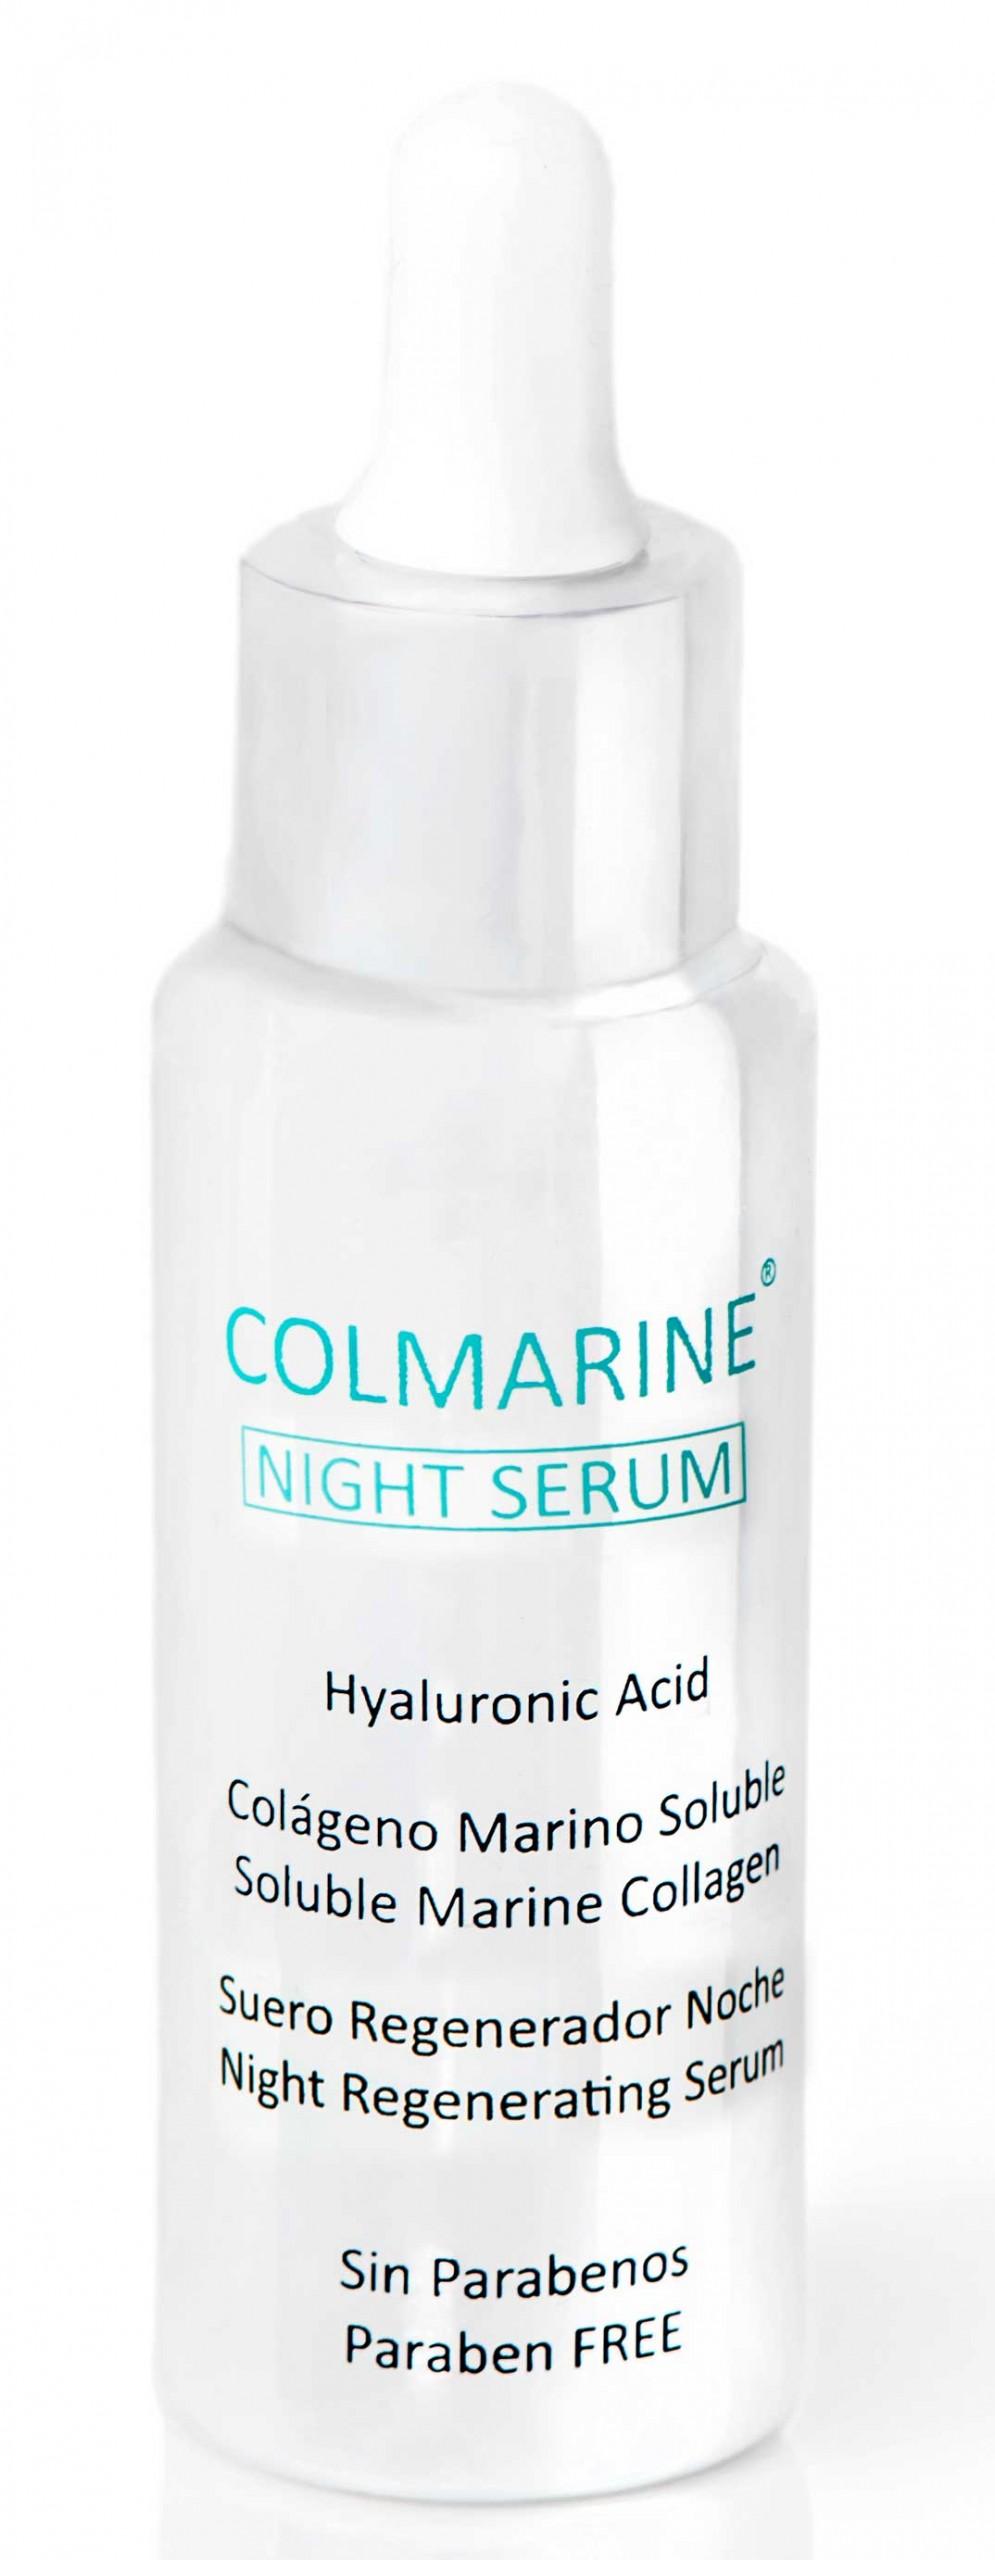 Night-Serum-Colmarine